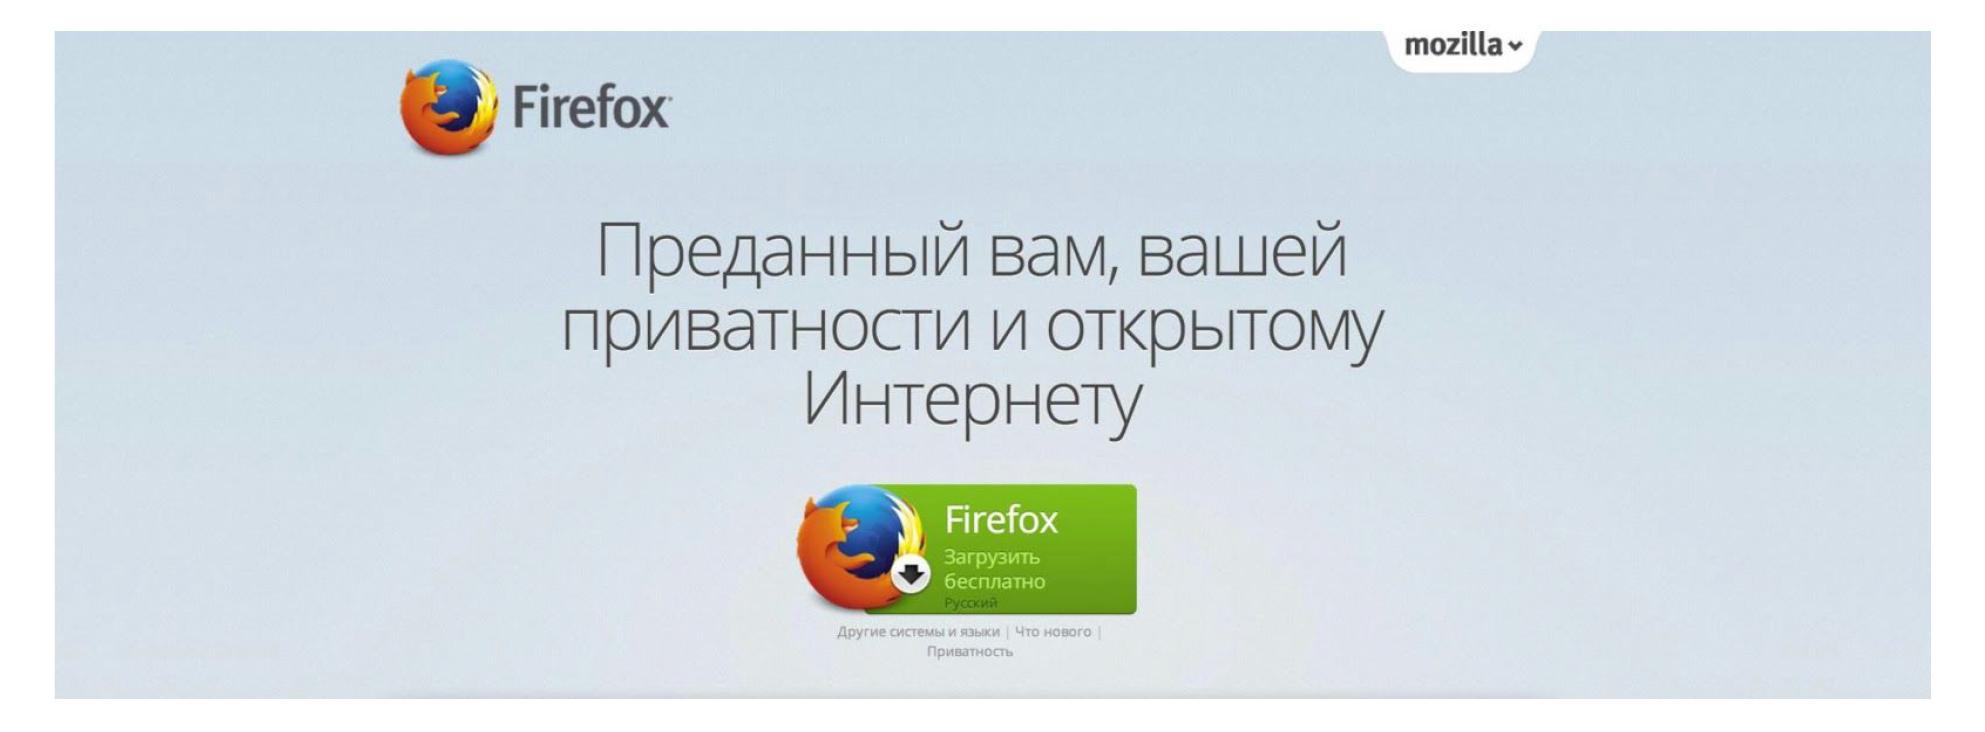 Зеленая кнопка Firefox